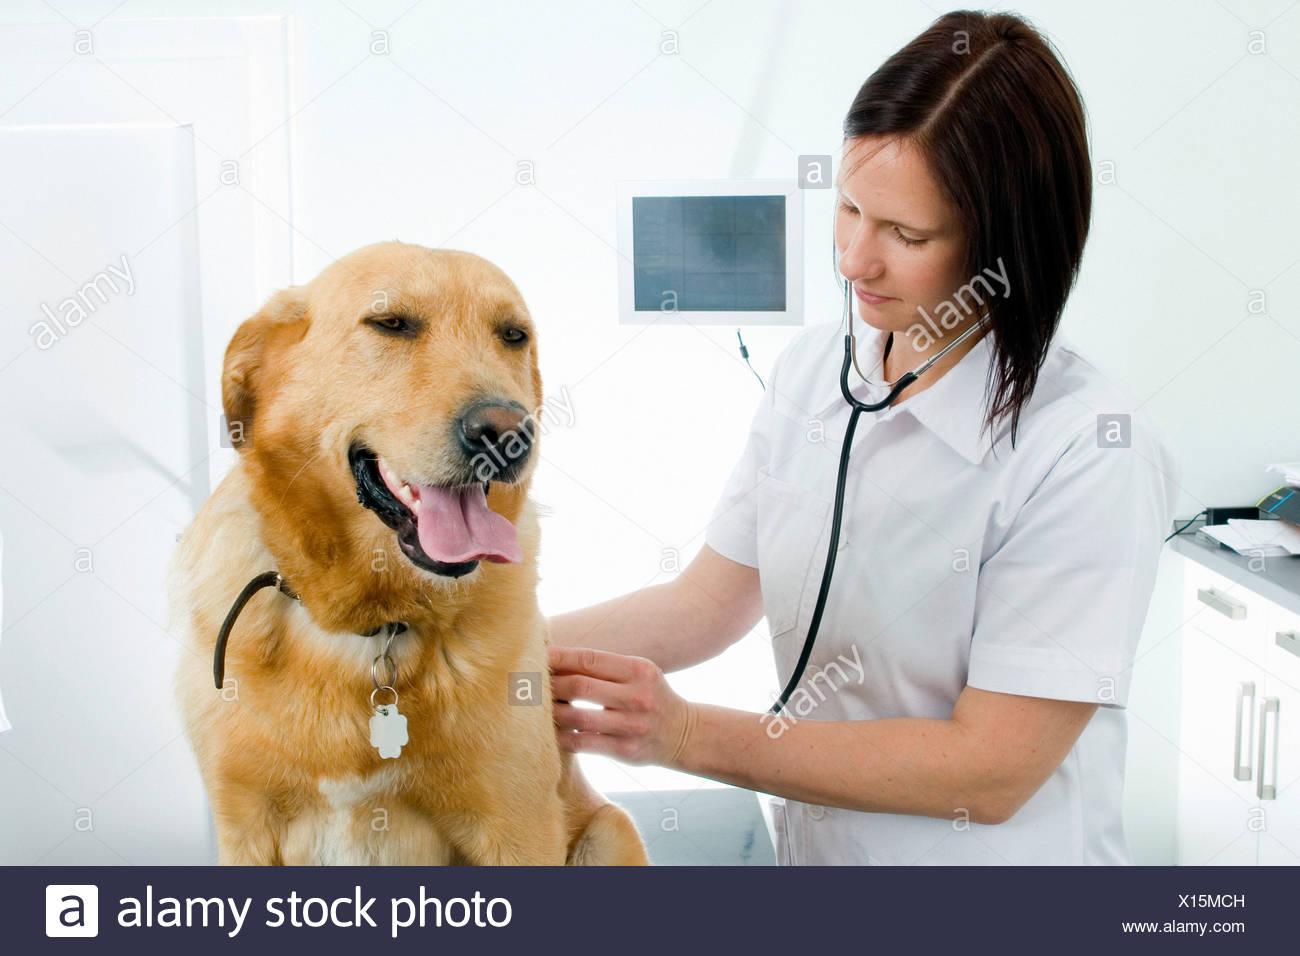 Veterinarian, veterinary surgeon, veterinarian, practise, examine, investigate, domestic animal, pet, ill, sick, dog, dog illnes - Stock Image